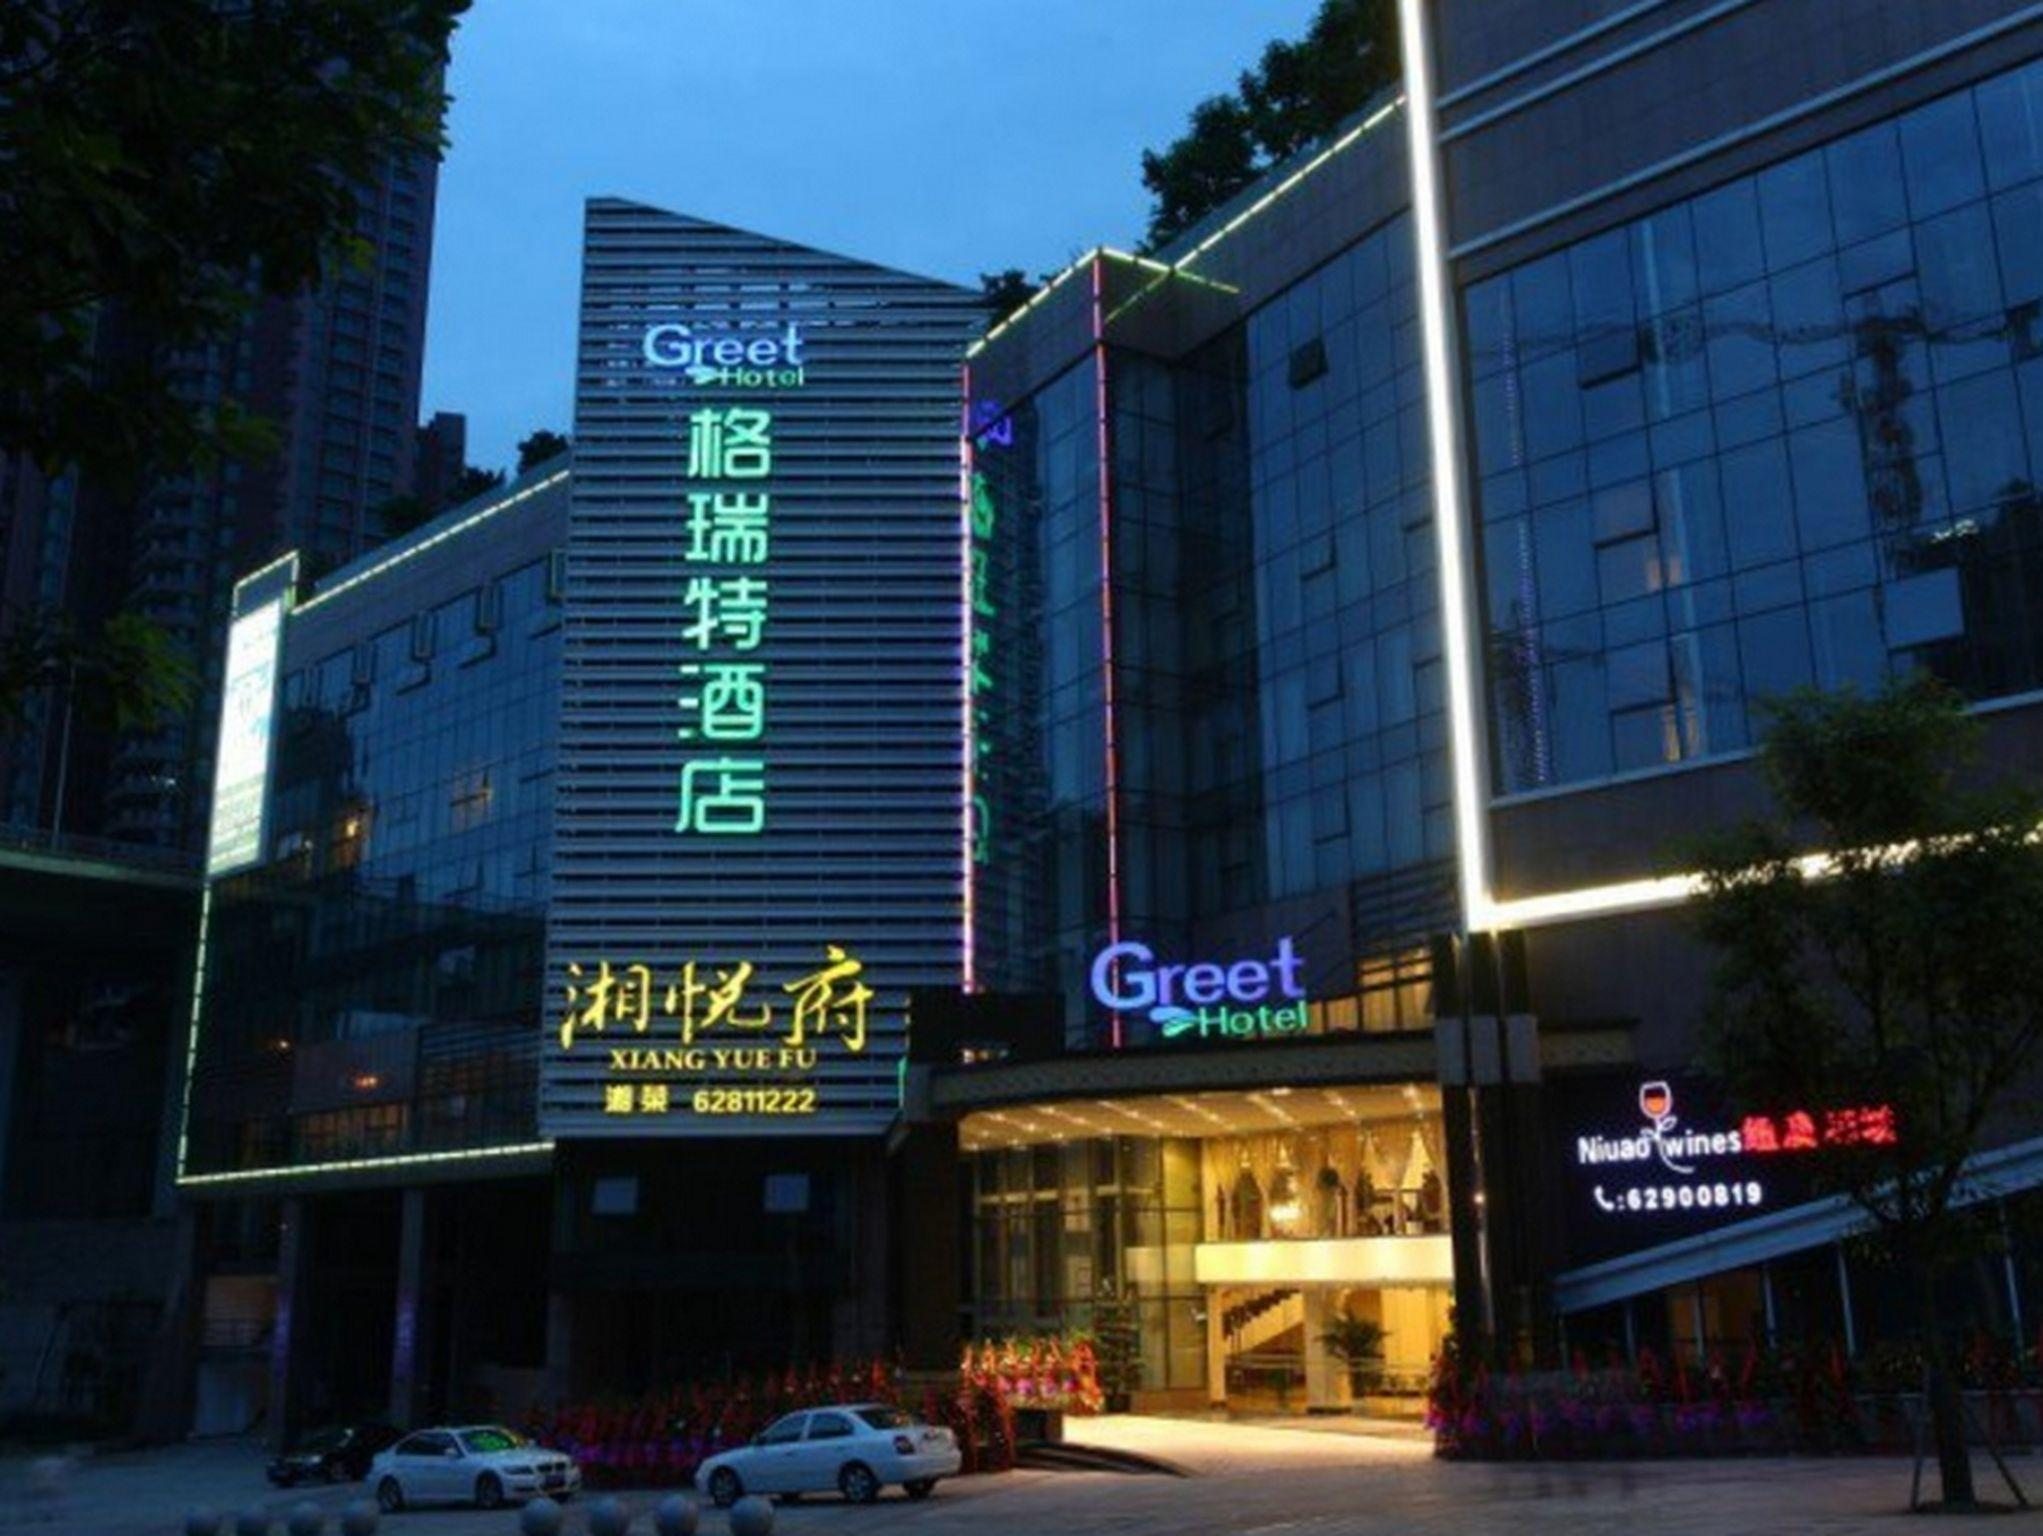 Chongqing Greet Hotel